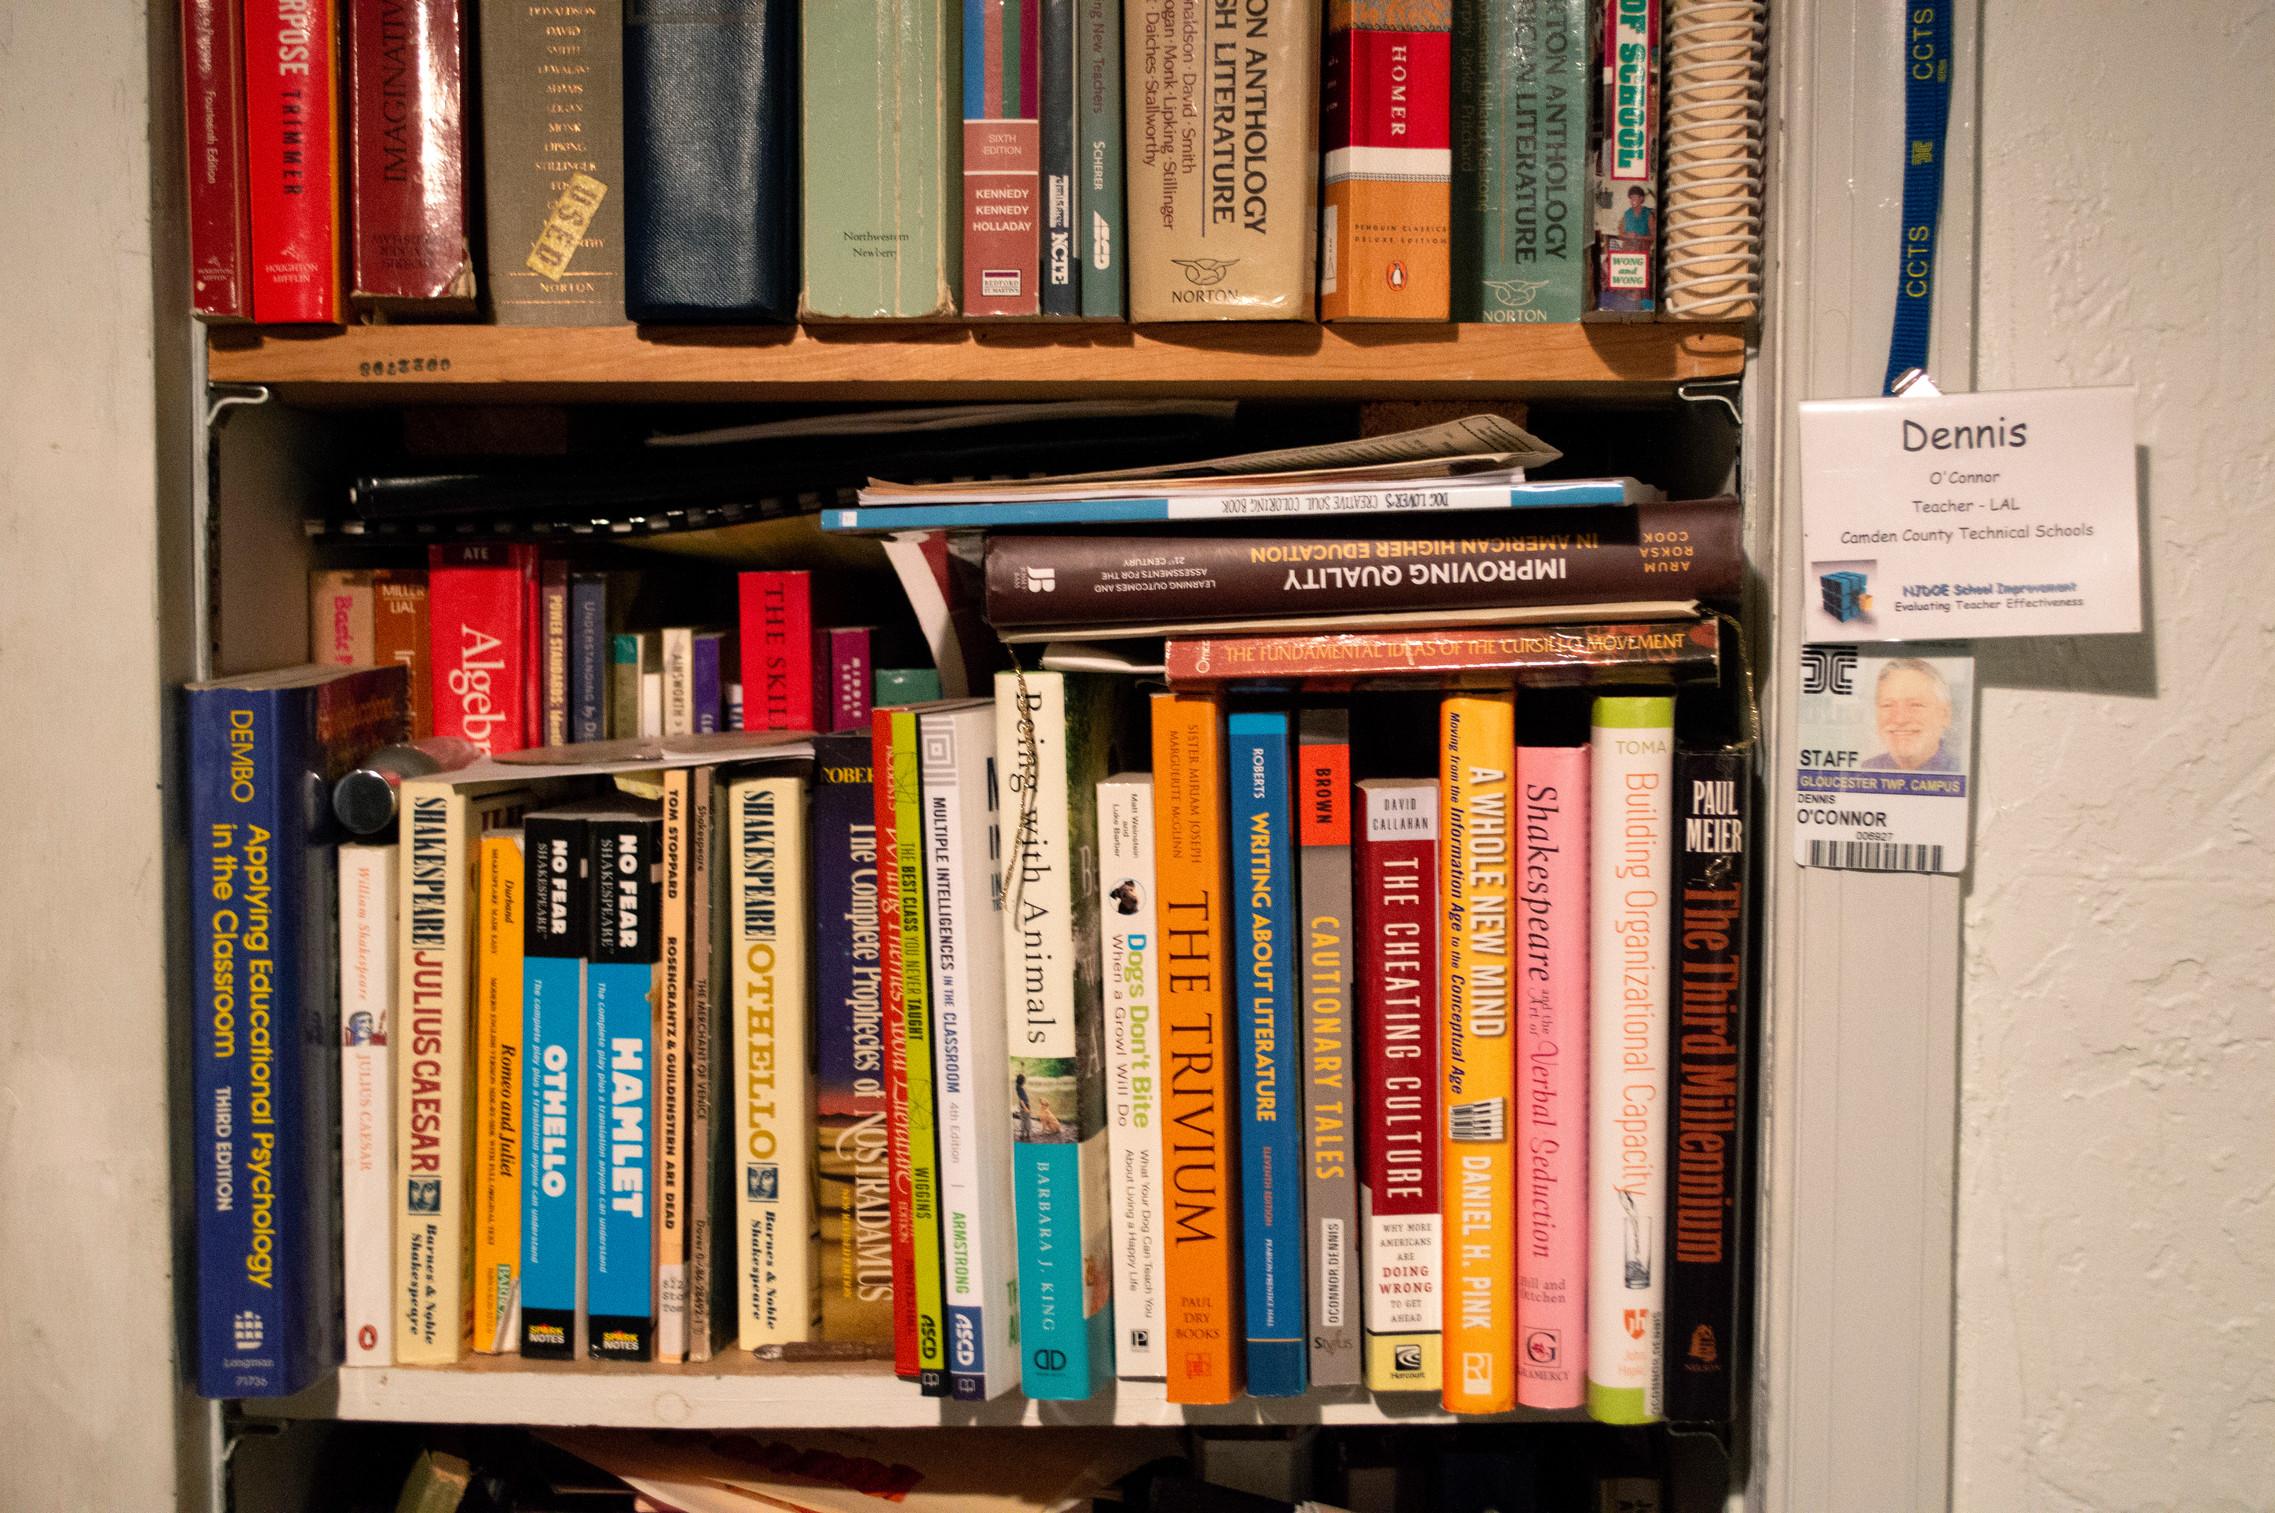 O'Connor's Library